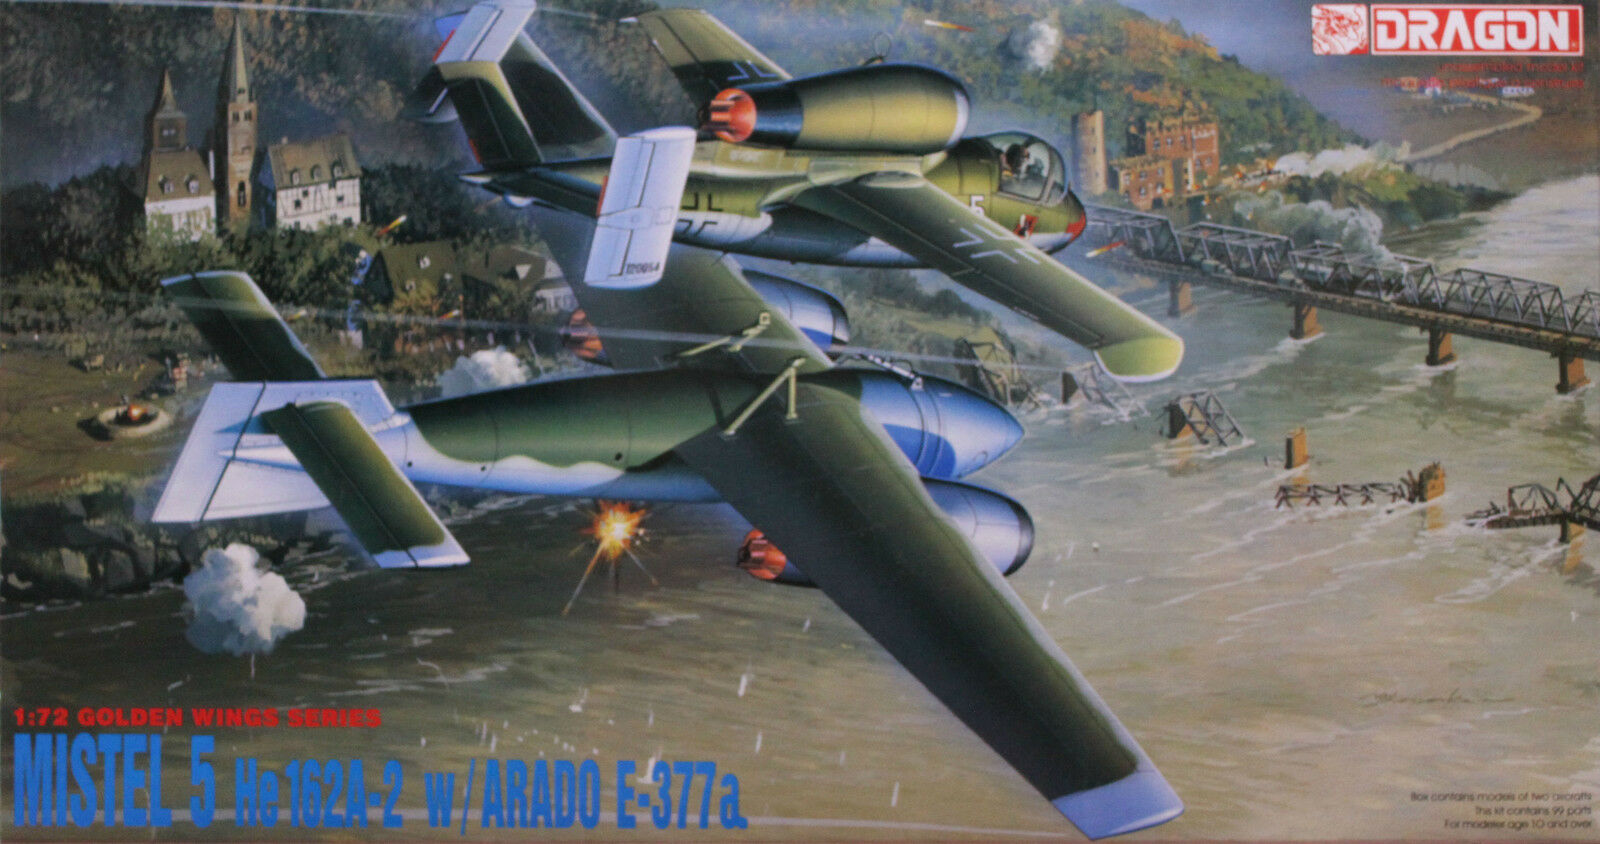 Dragon 1 72 5002 WWII German MISTEL 5 He-162A-2 Fighter w Arado E-377a